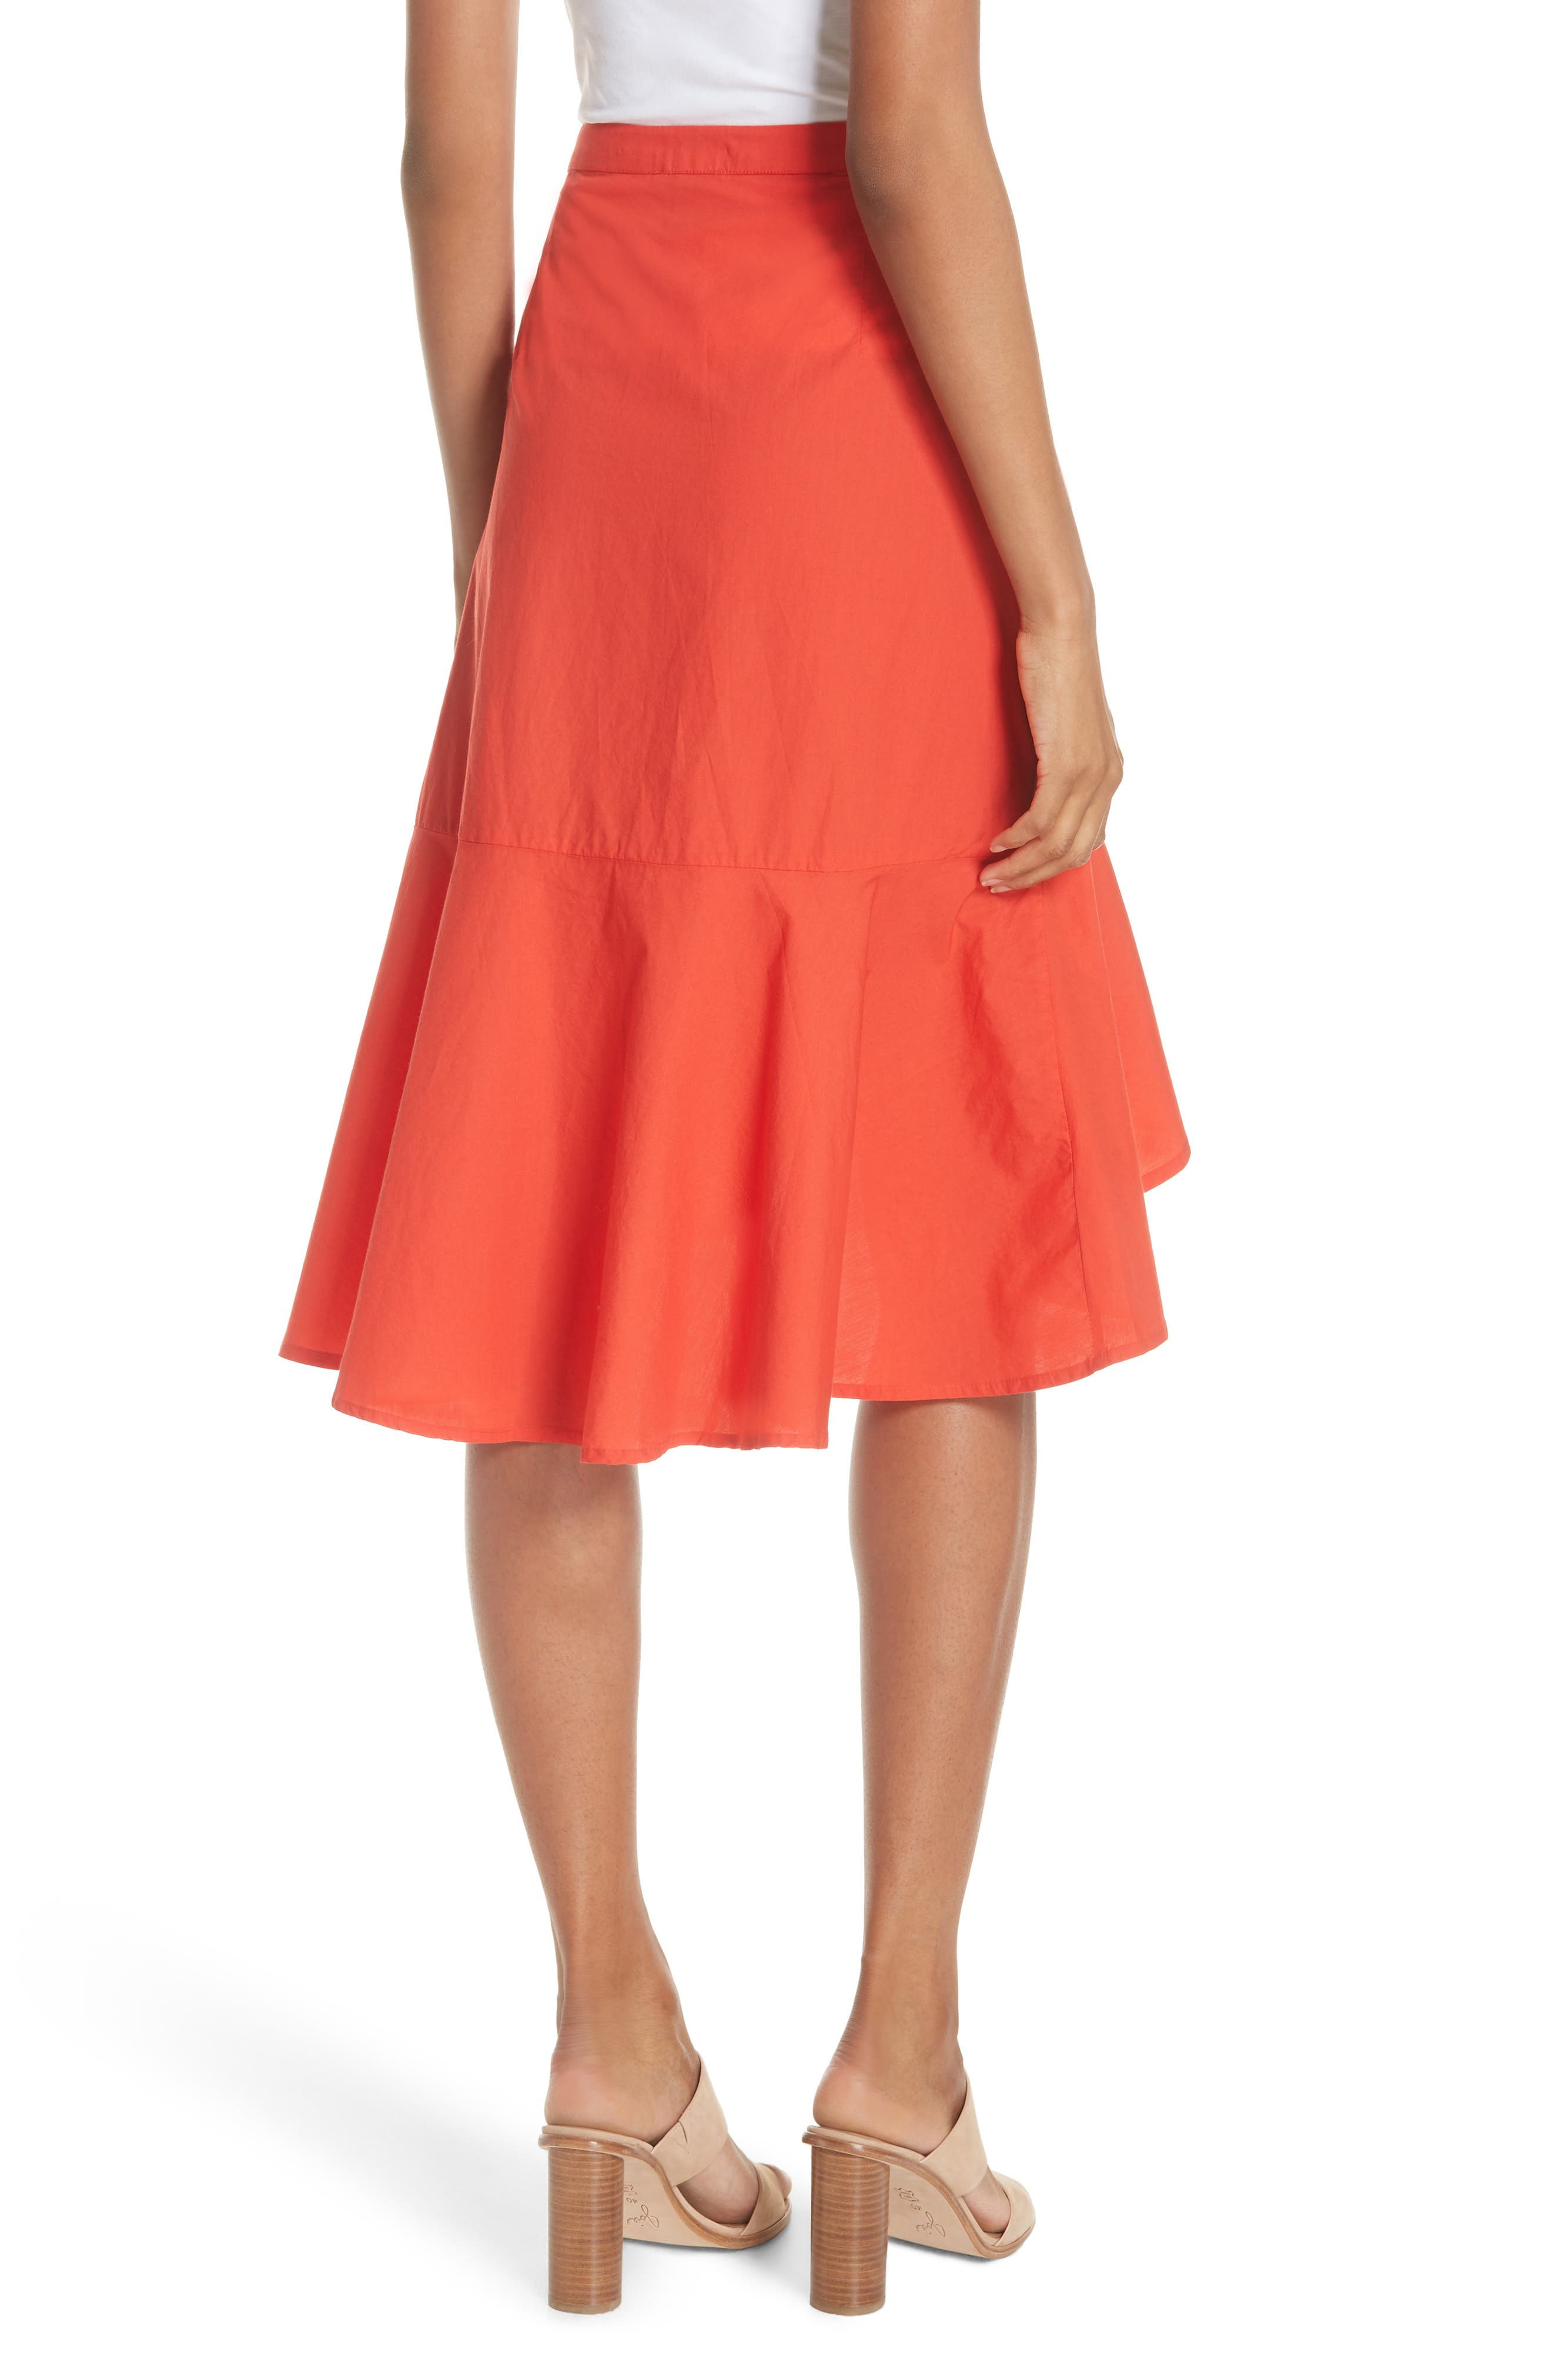 Chesmu Ruffled Cotton Skirt,                             Alternate thumbnail 4, color,